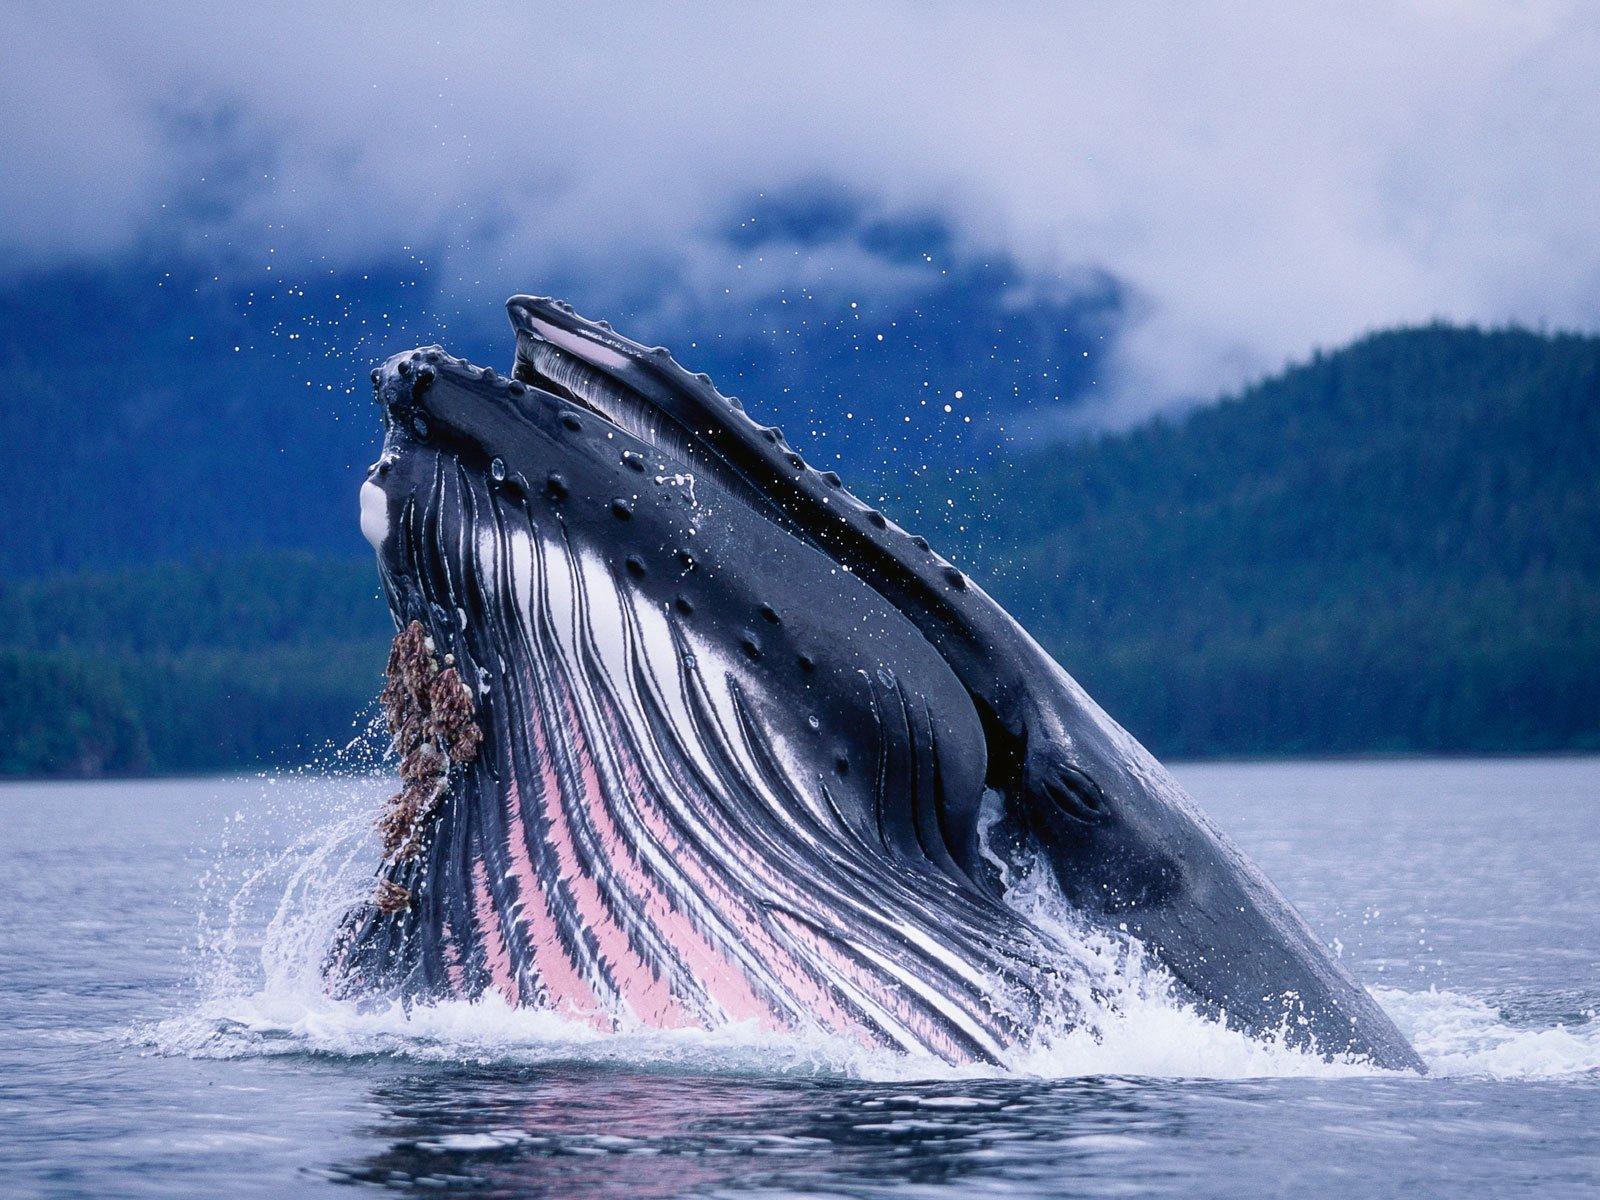 Kambur balina-3